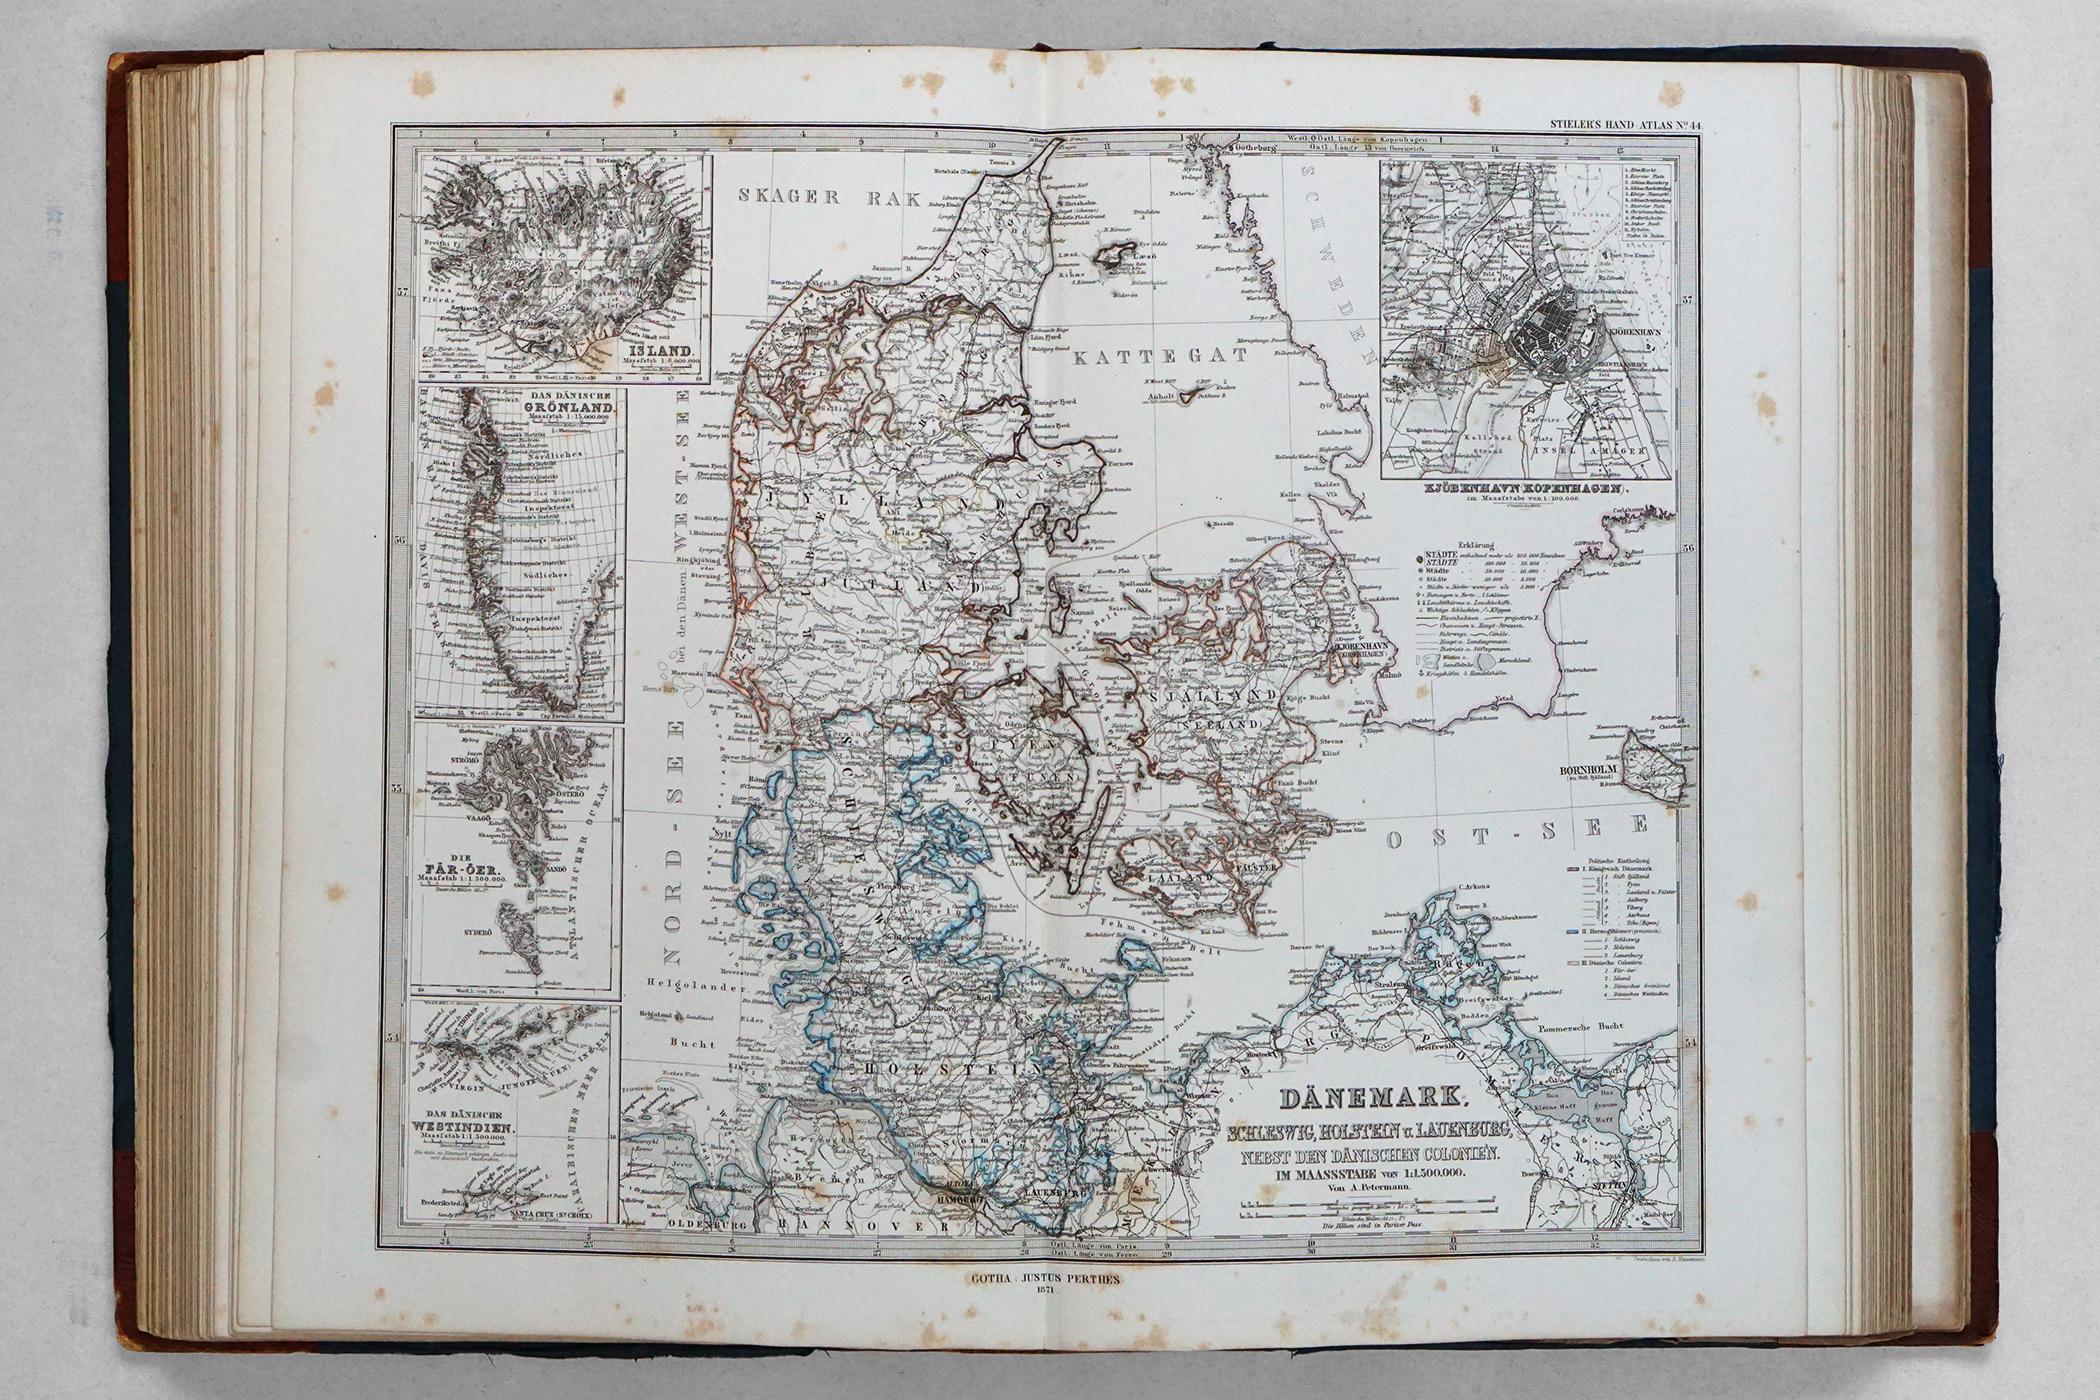 Stielers Hand-Atlas, 6th edition